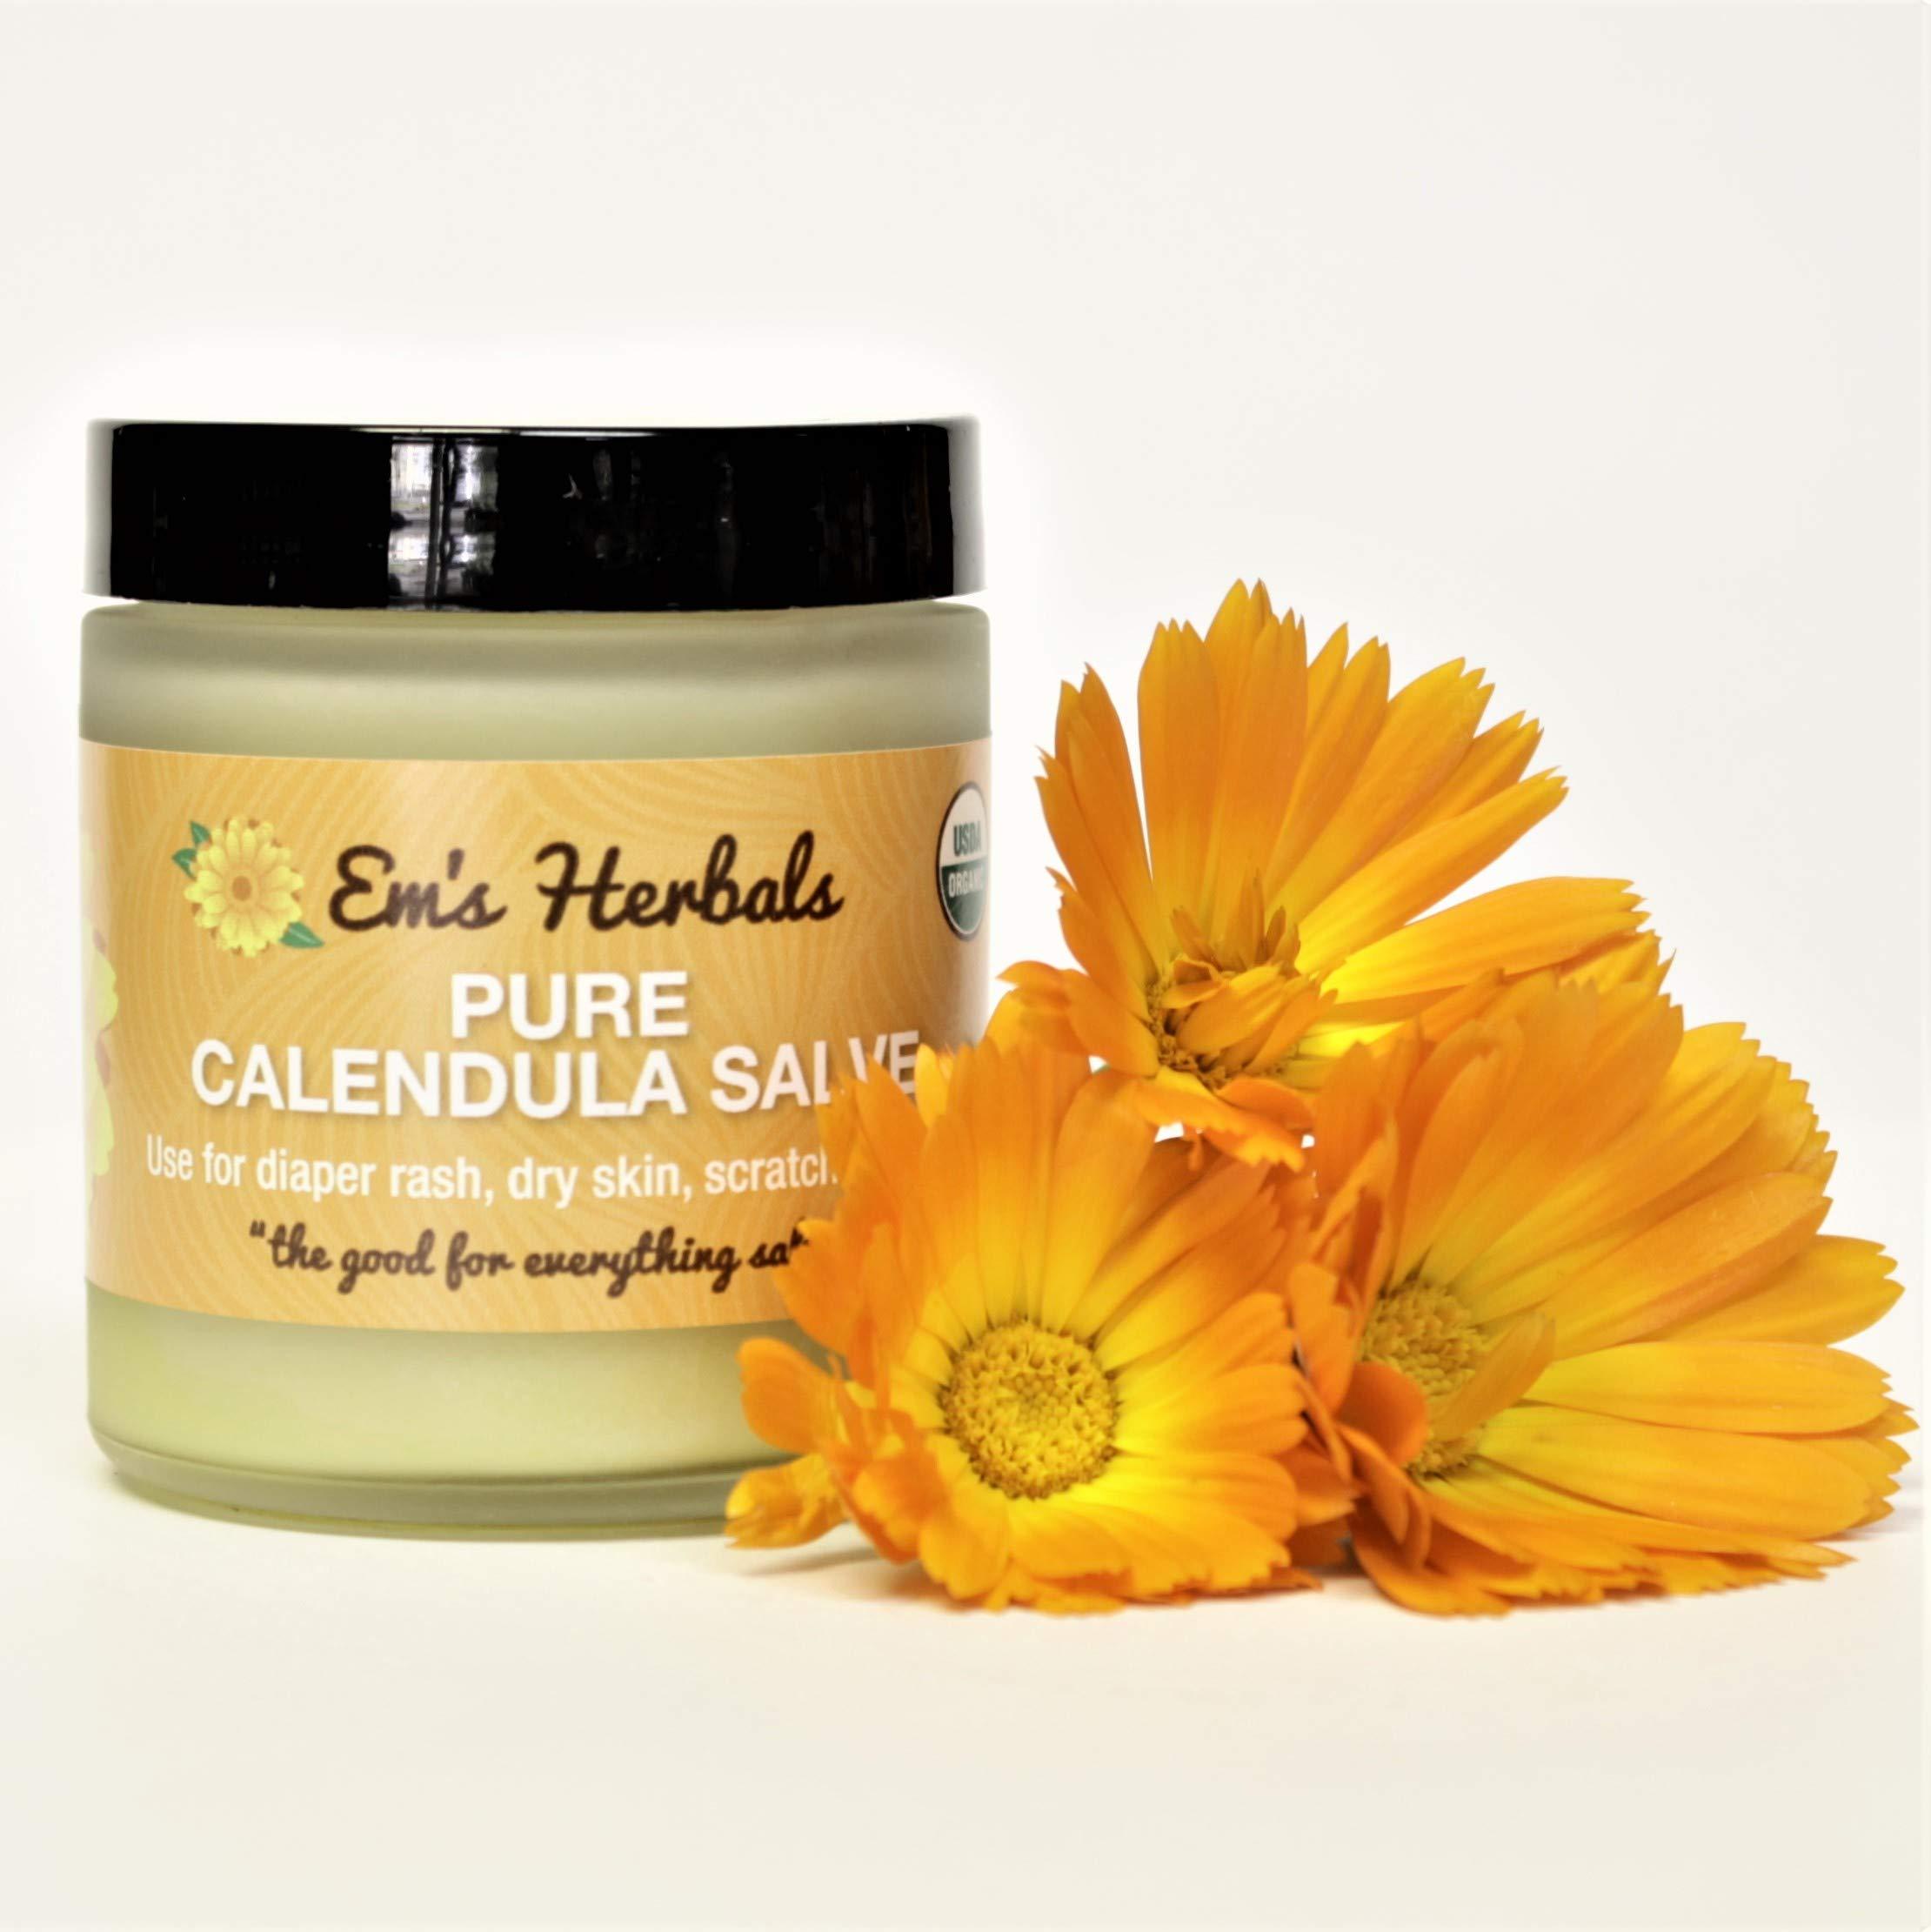 Em's Herbals Pure Calendula Salve, 8 oz. by Em's Herbals